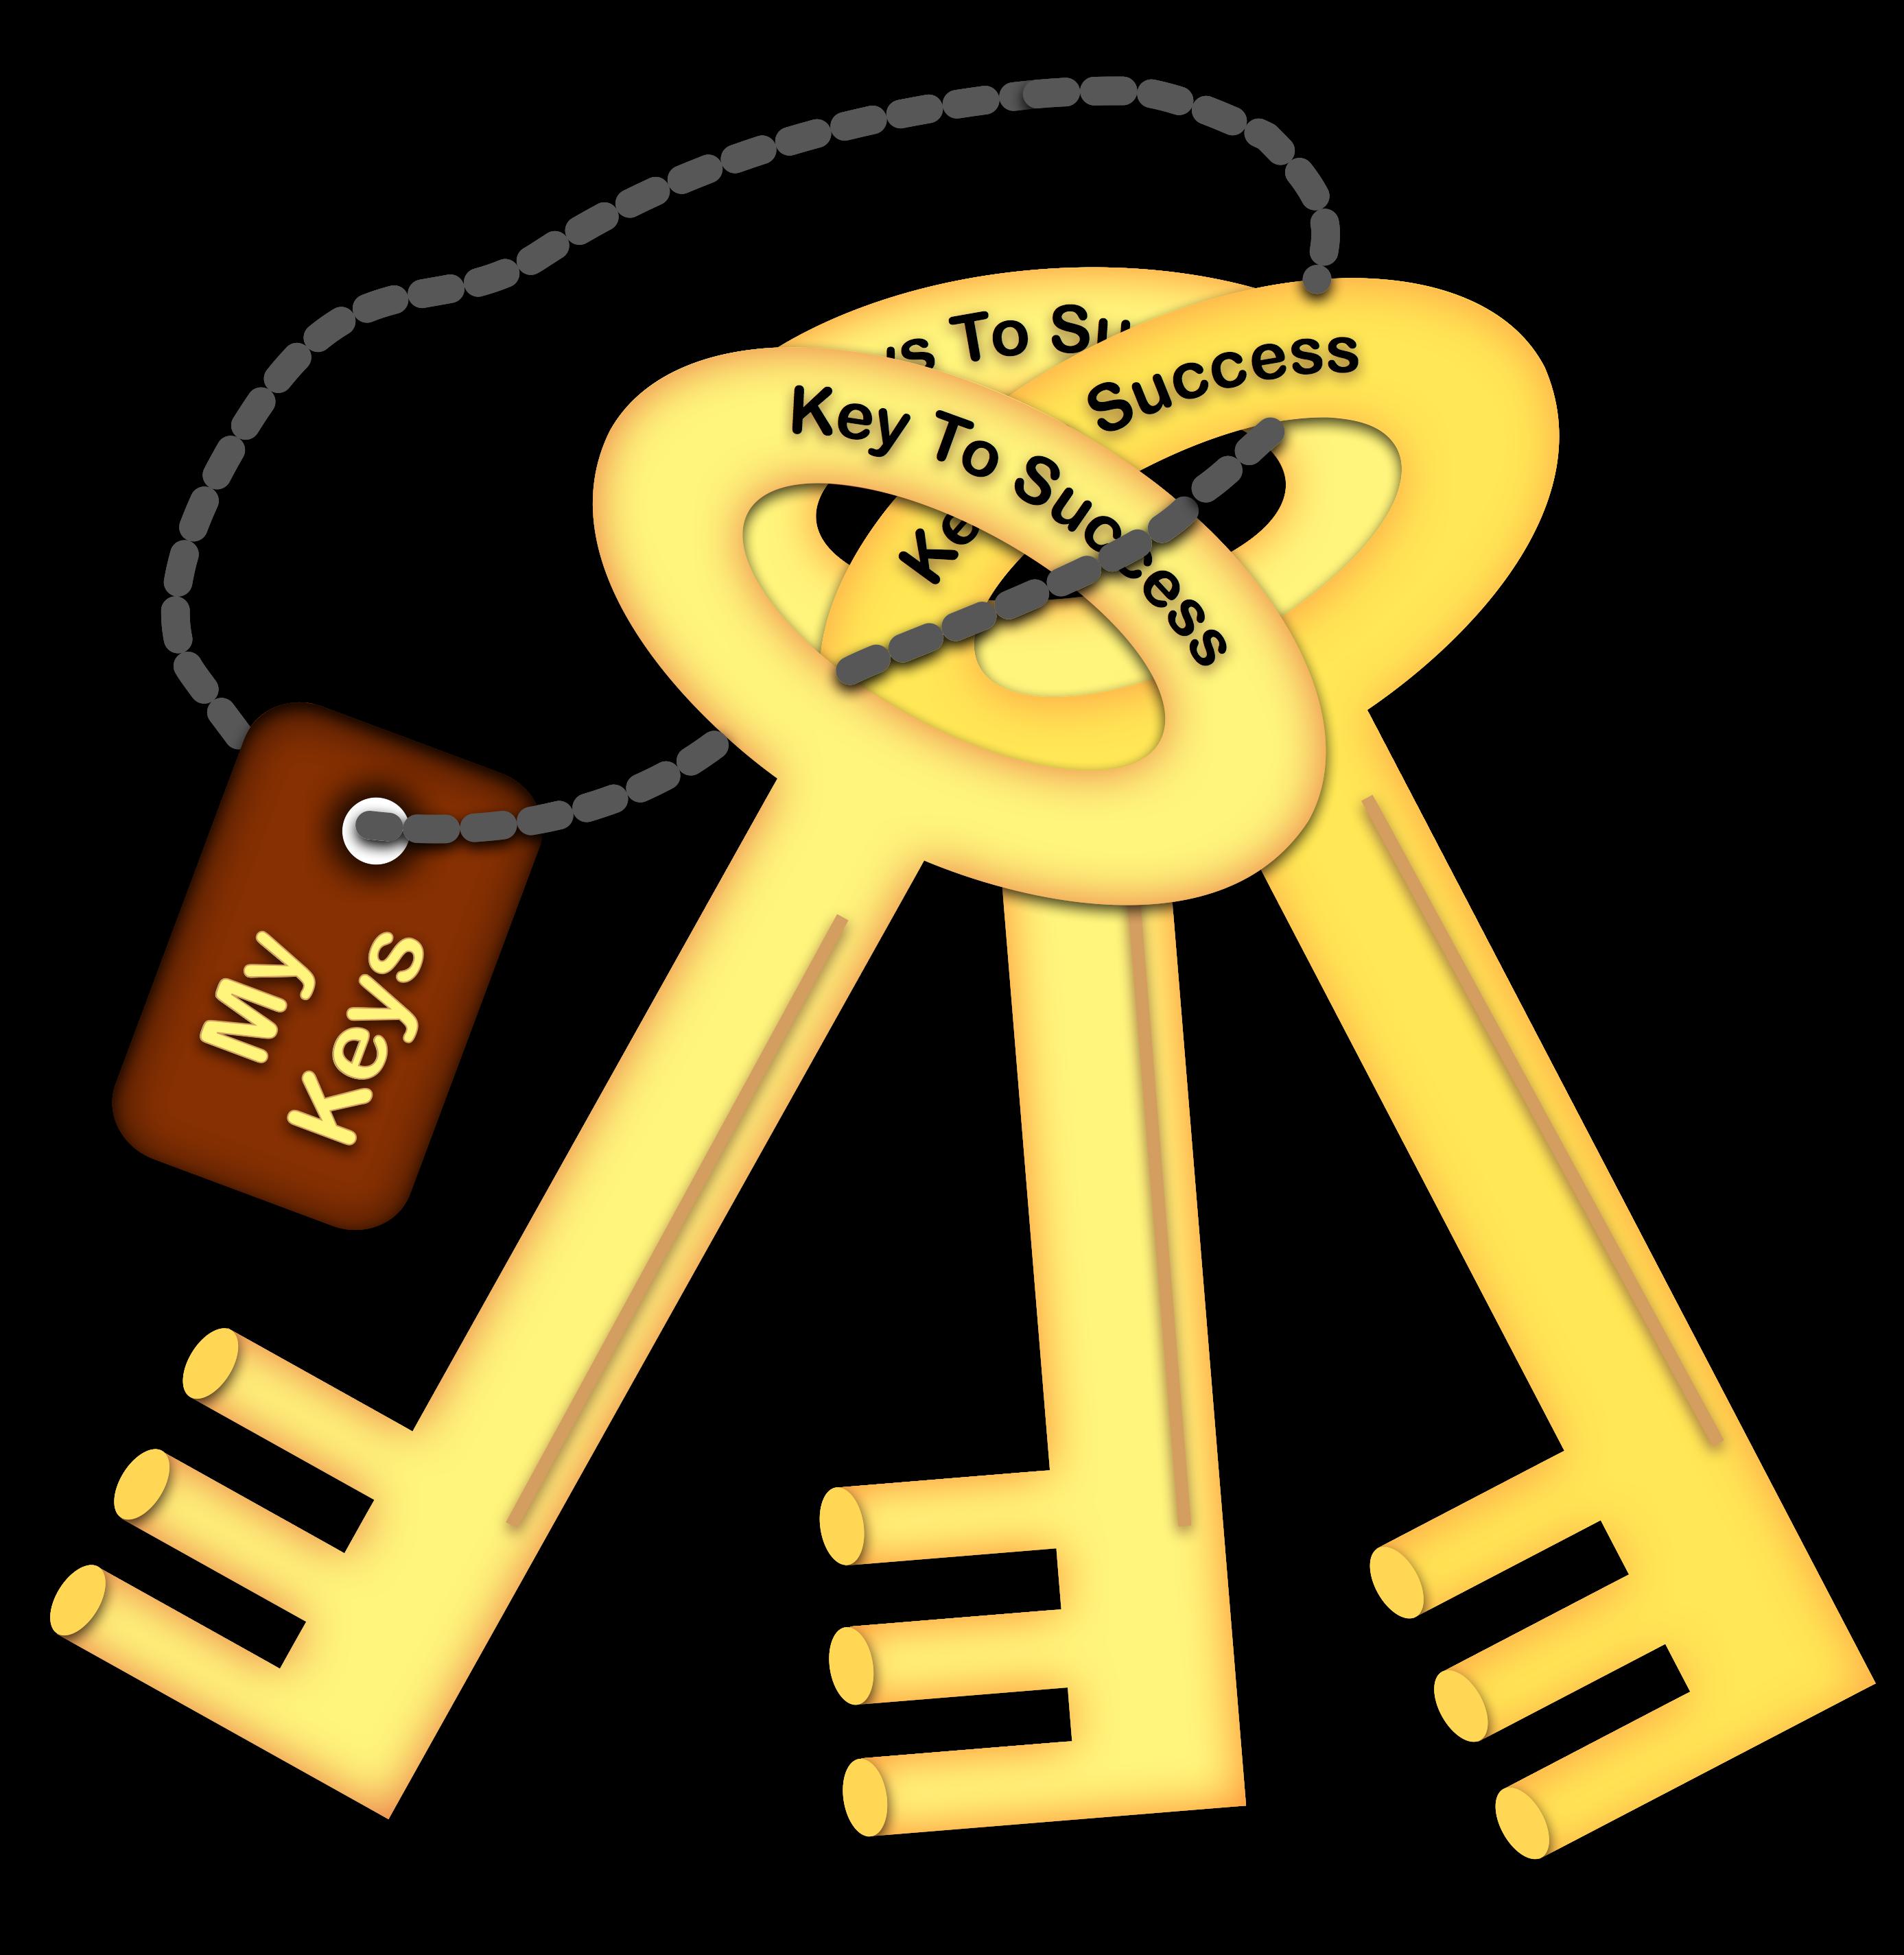 Key 3 key